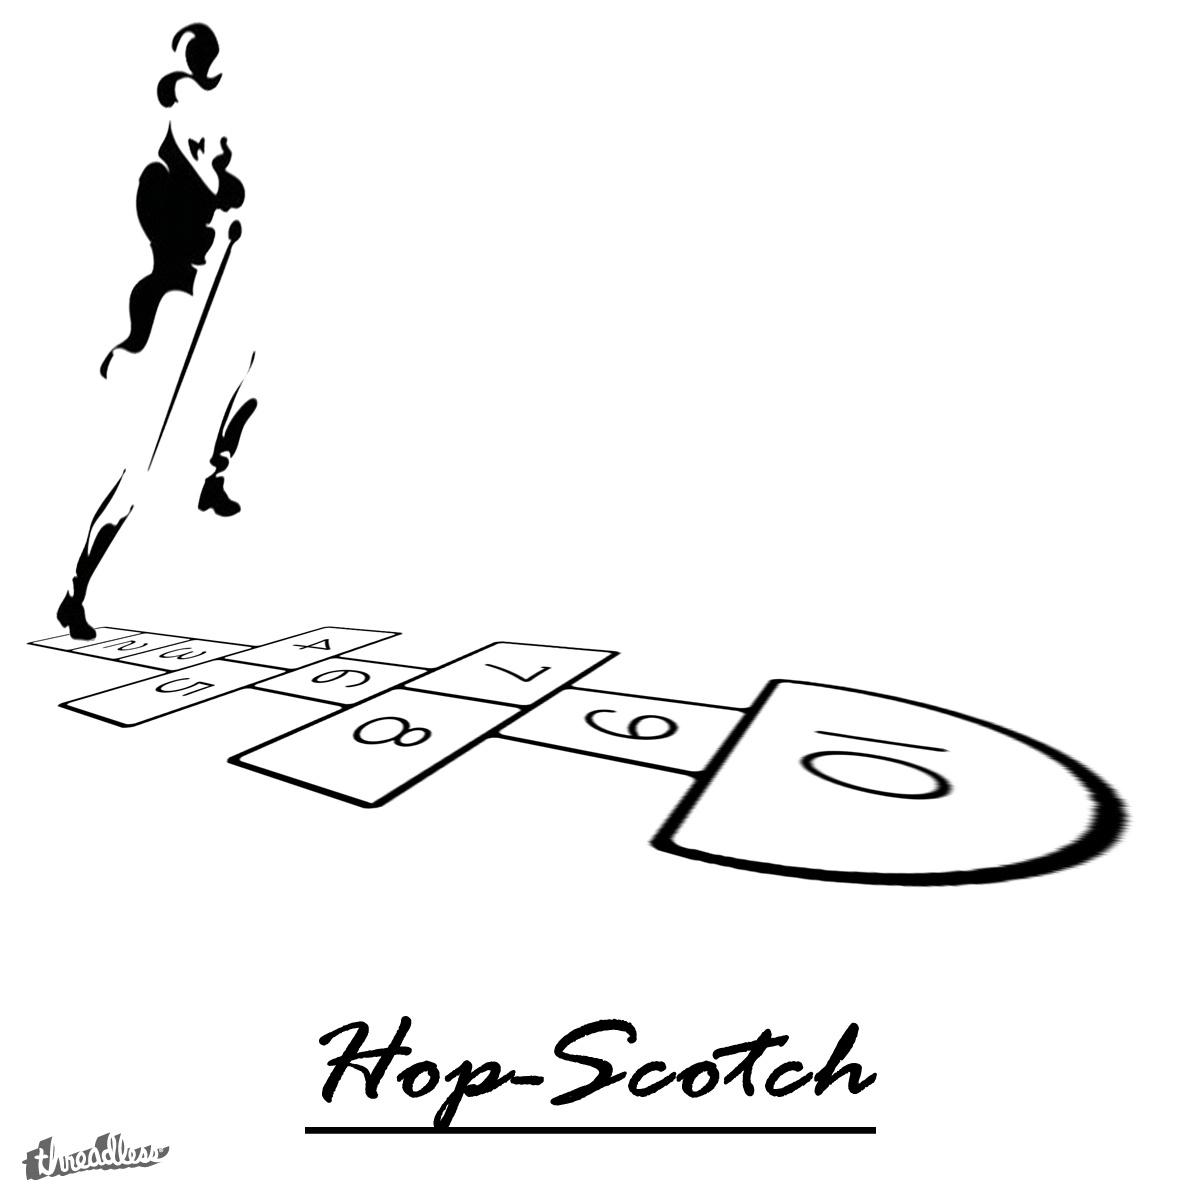 Hop-Scotch by Jugal on Threadless